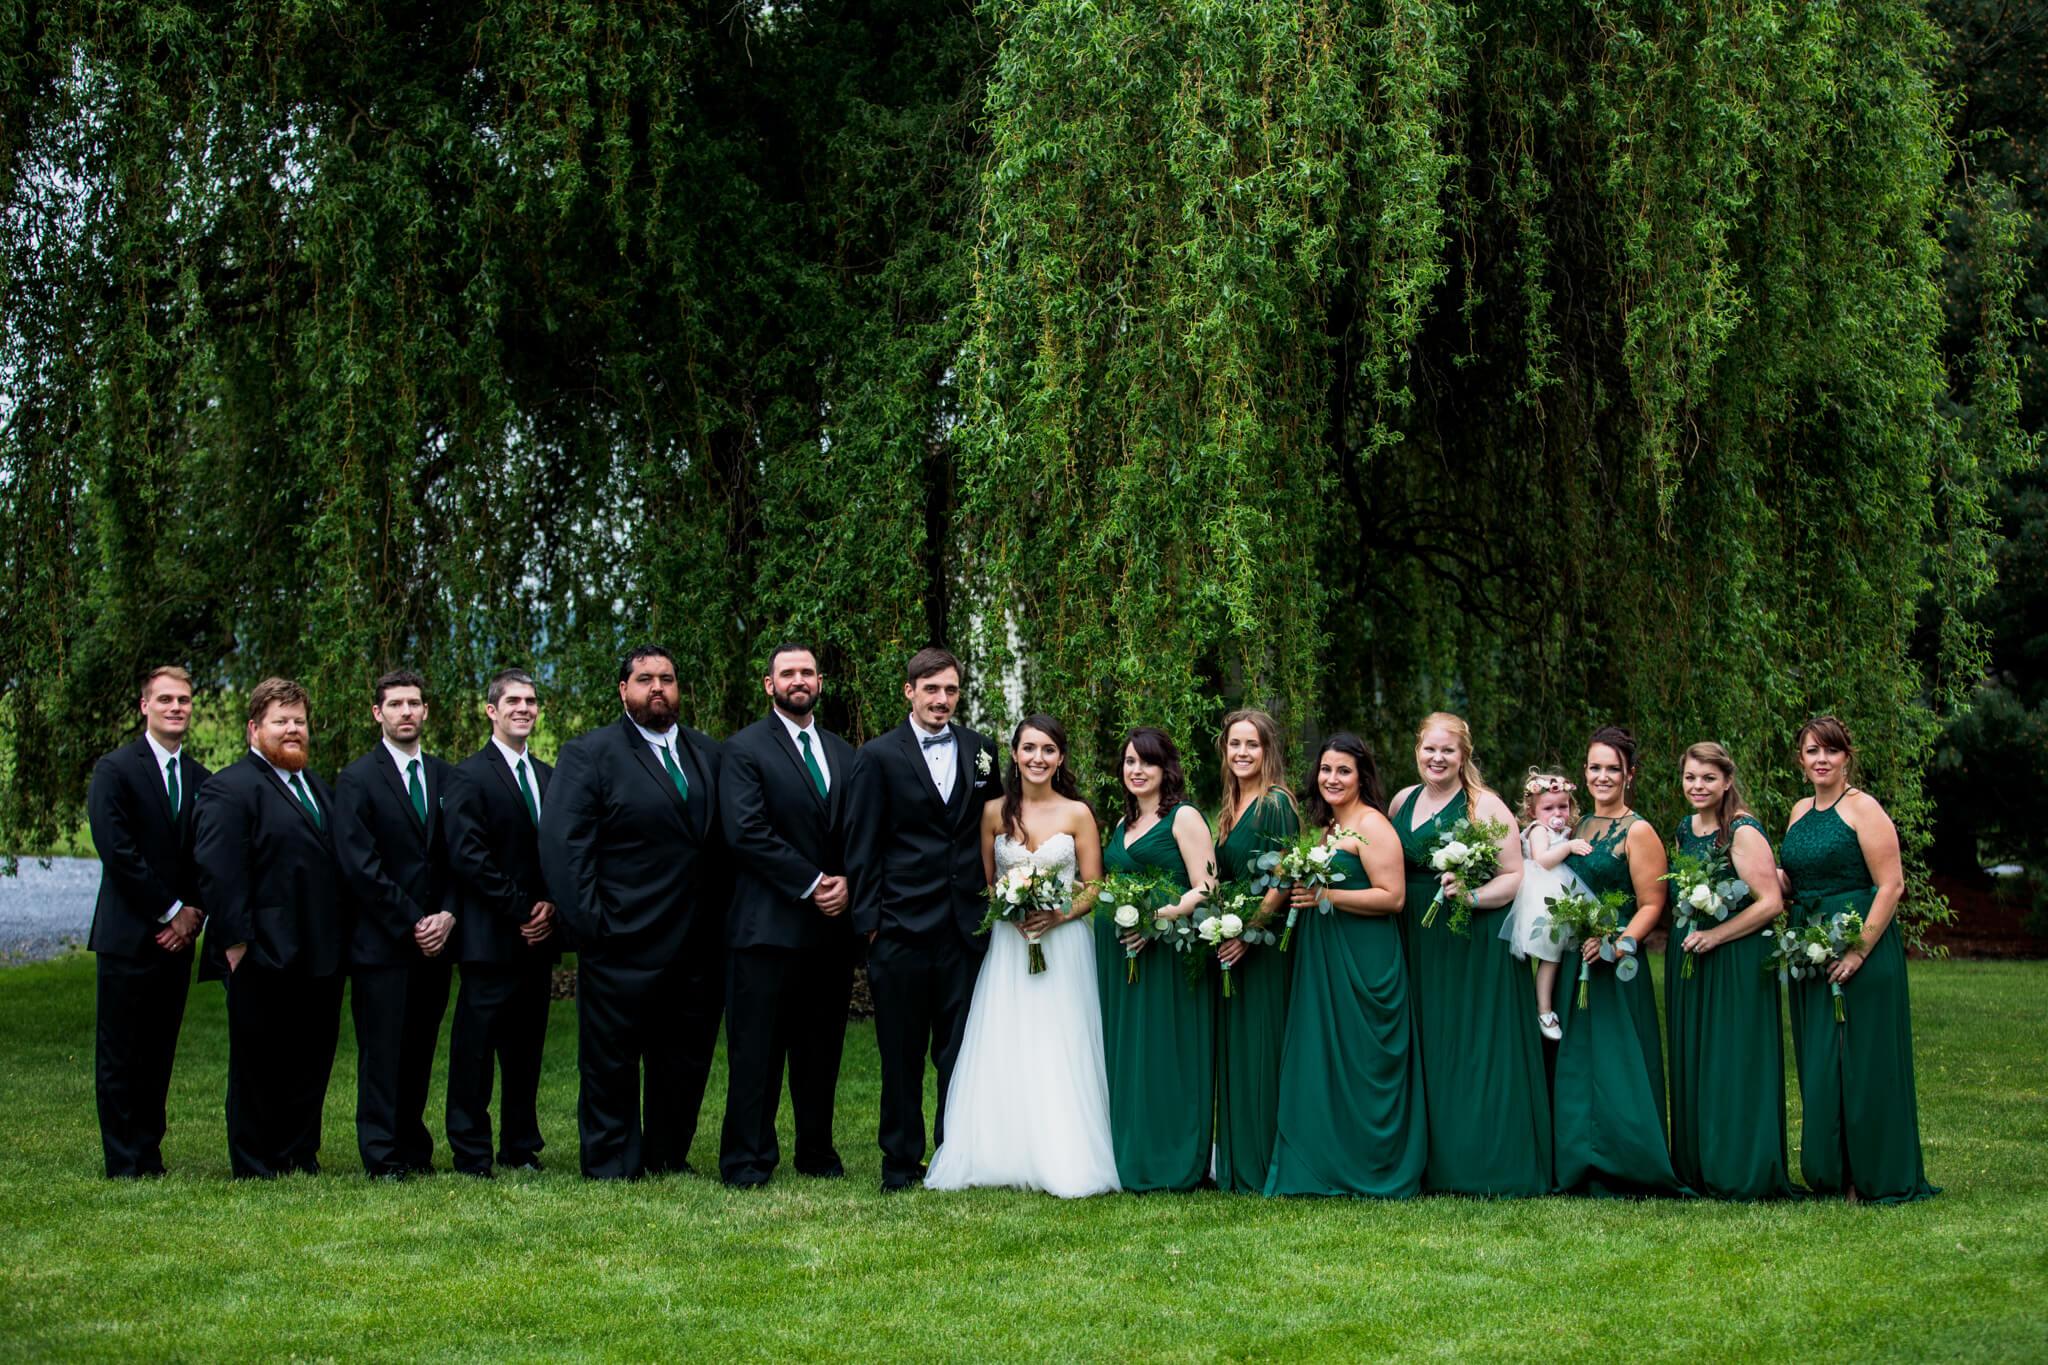 Alysia Jerad Homestead Blessings Farm Hershey PA Wedding Rustic Chique - 74.JPG